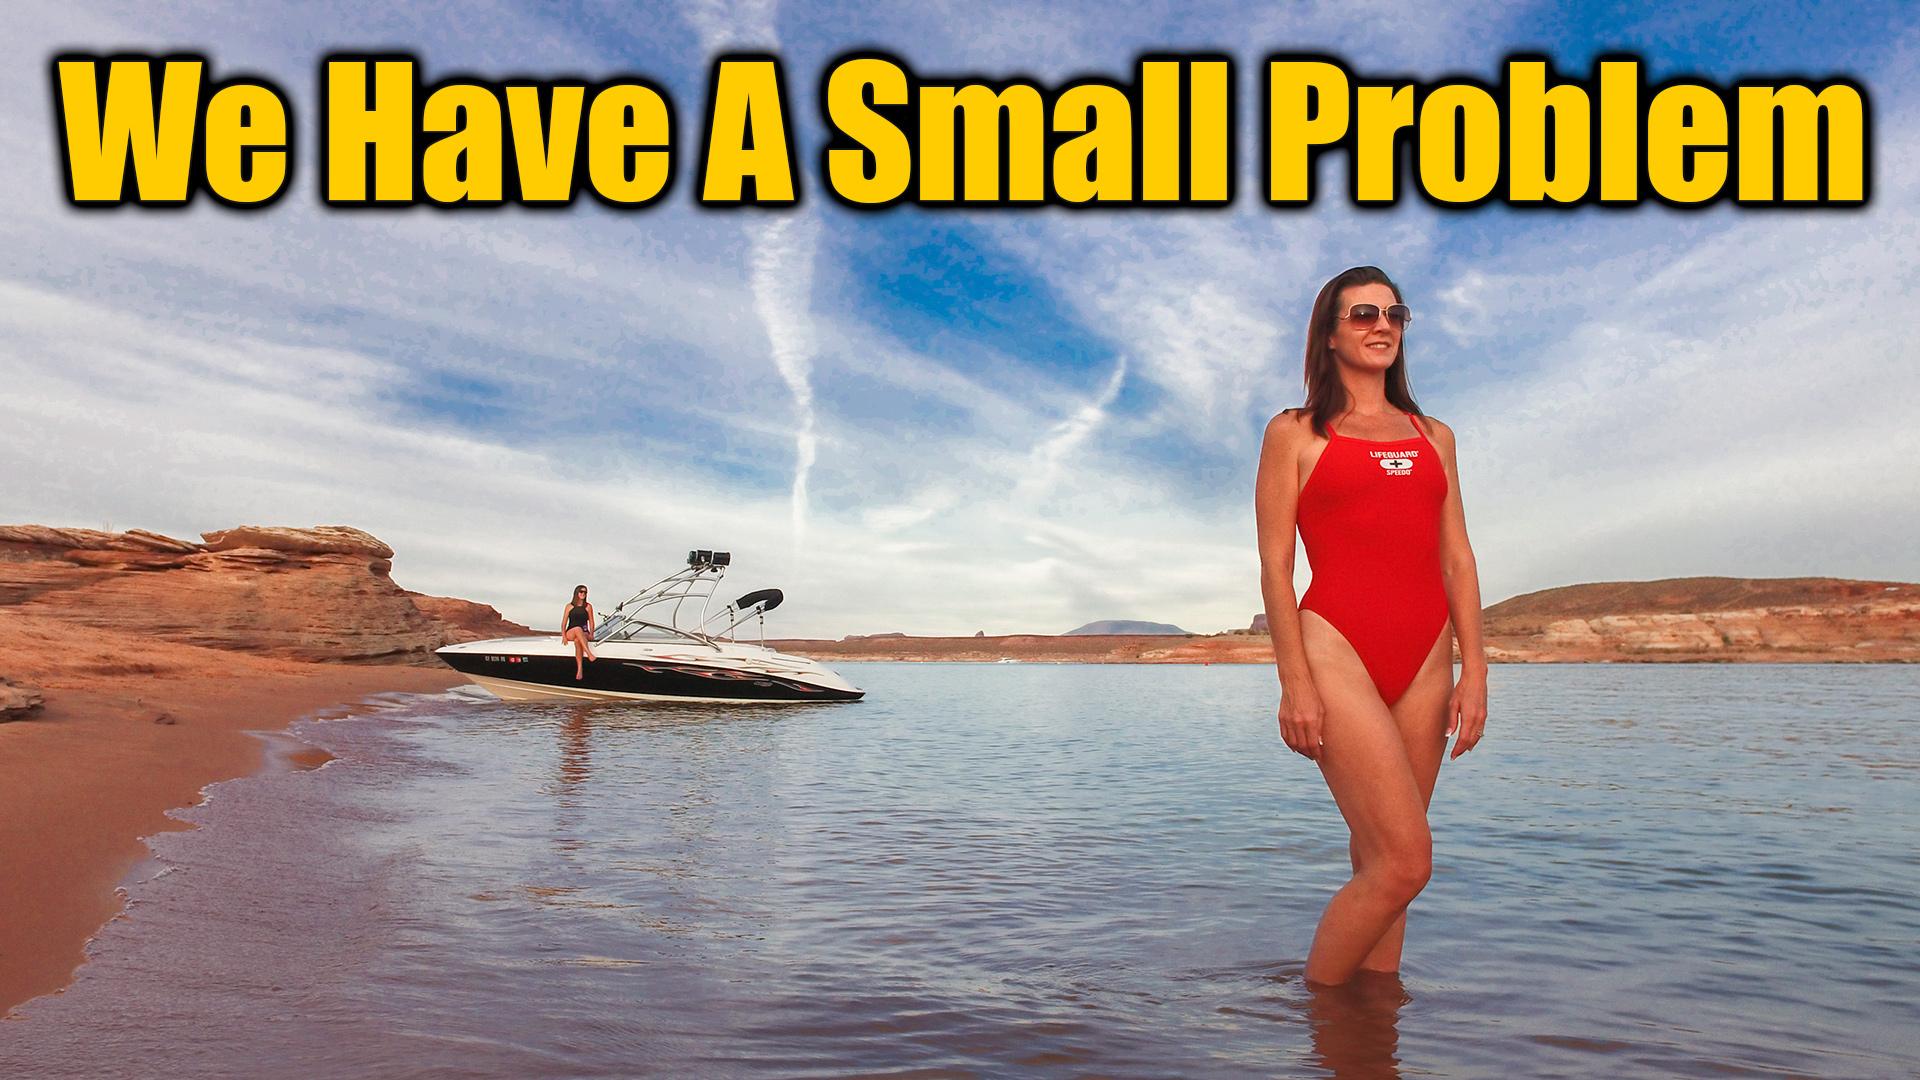 SmallProblem